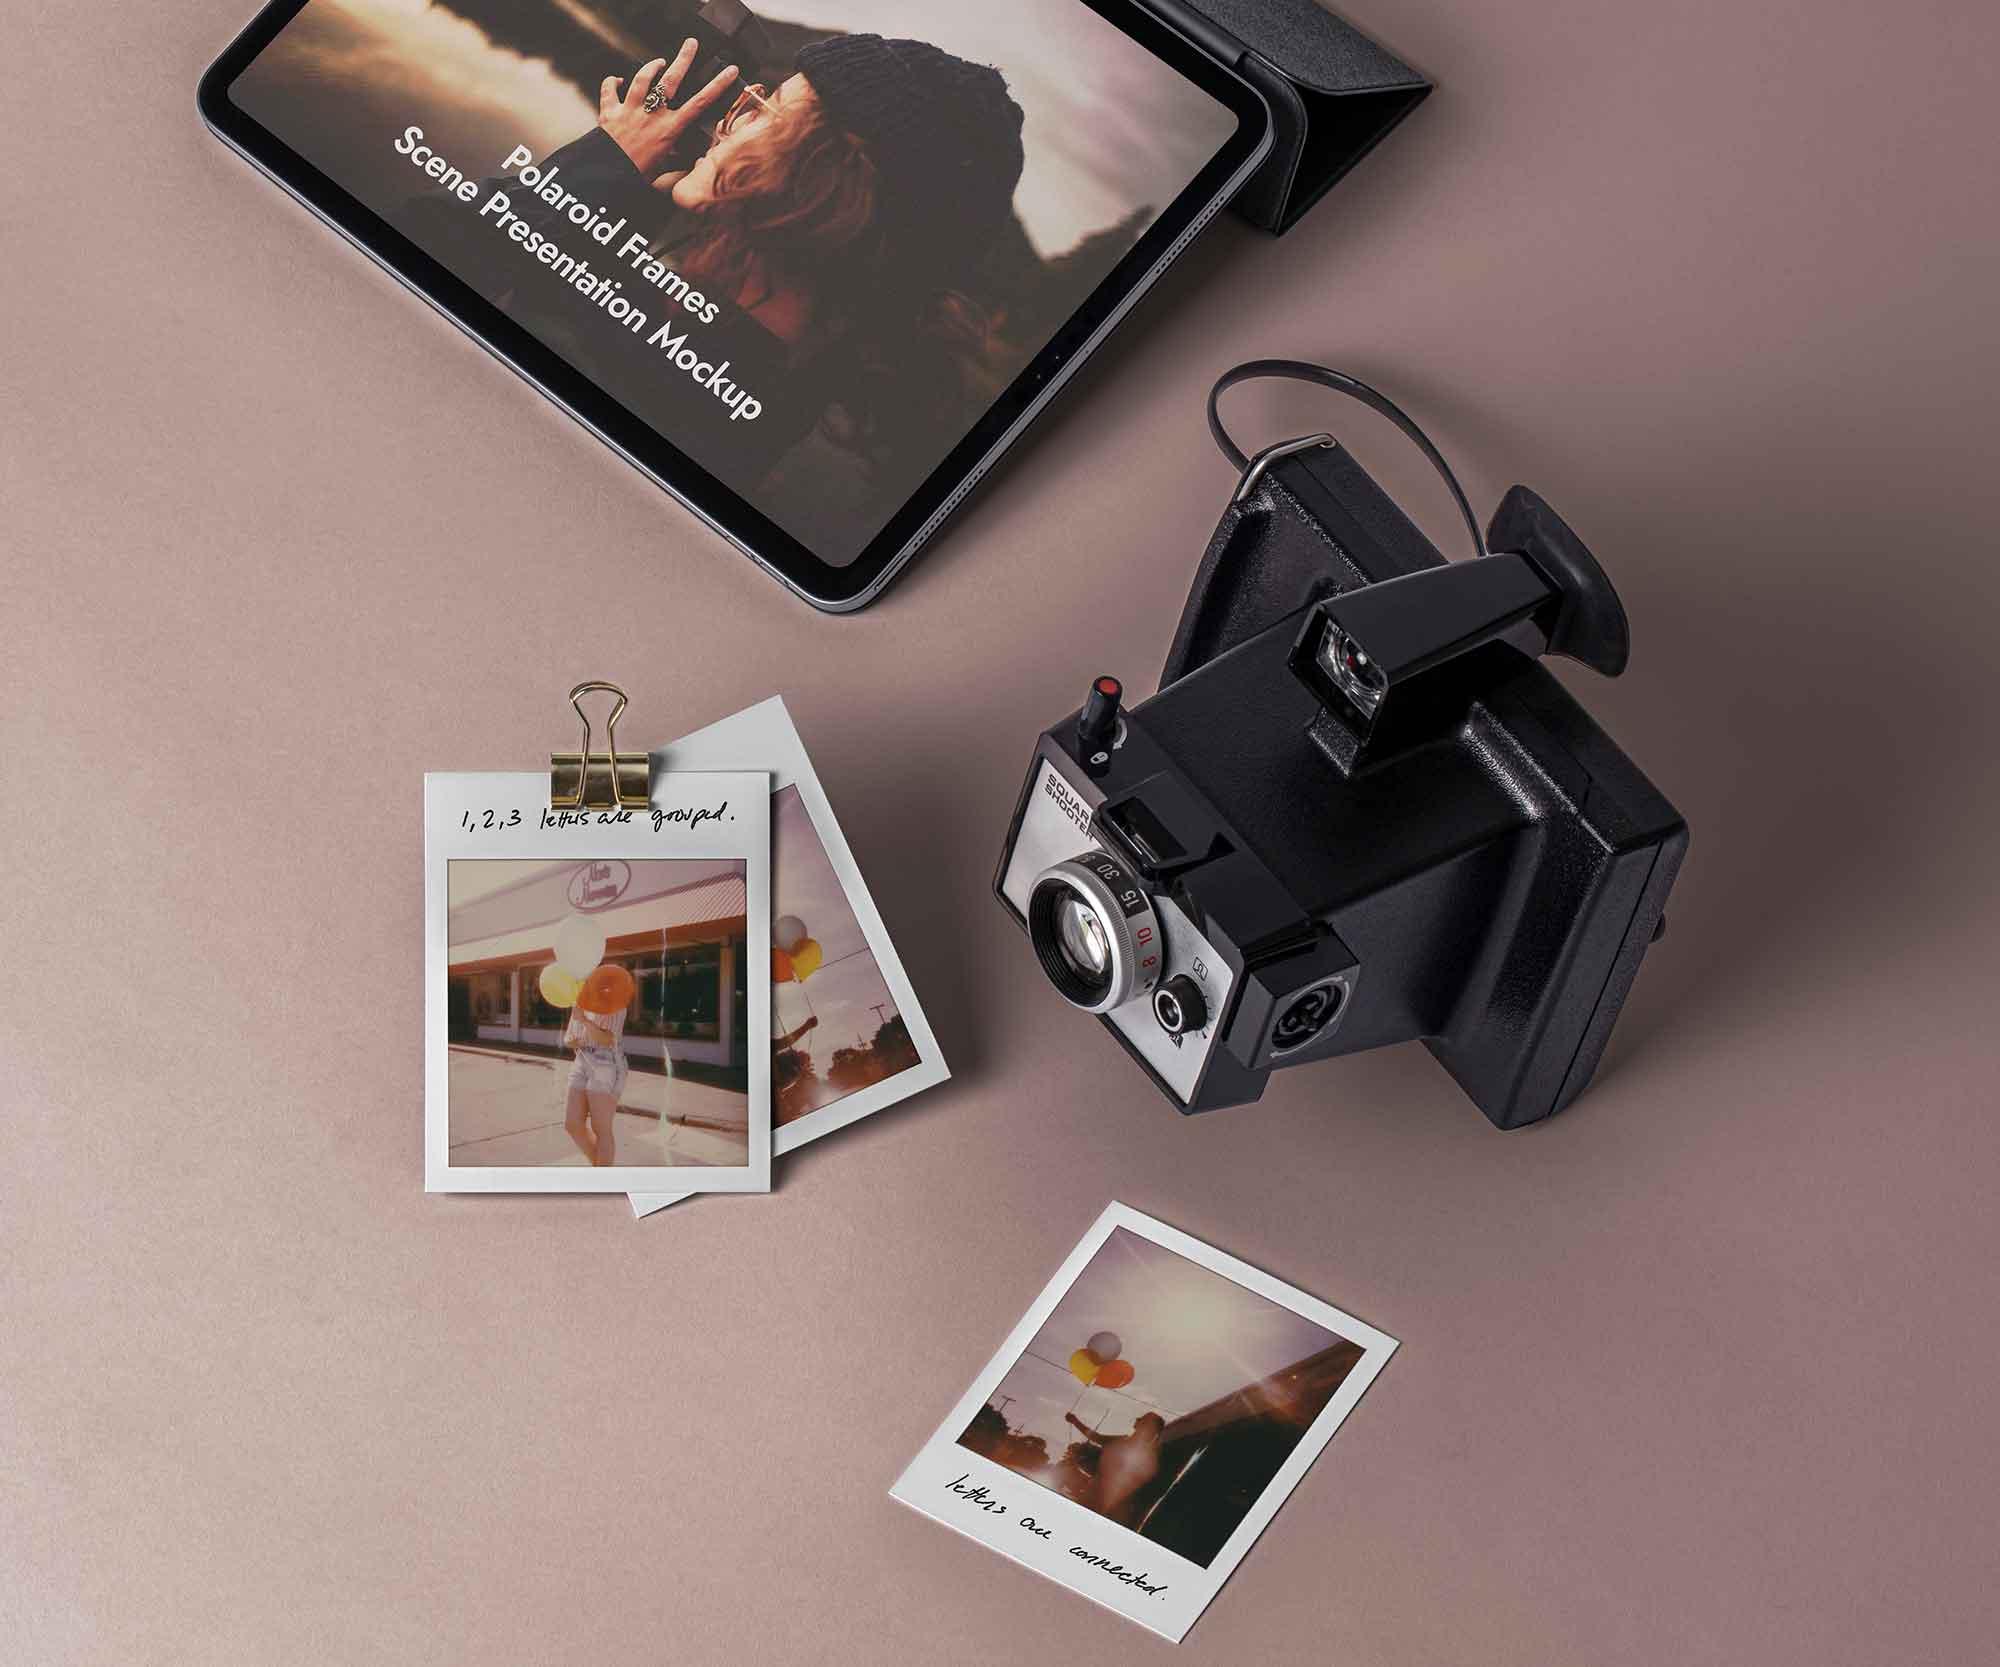 Polaroid Mockup Frames